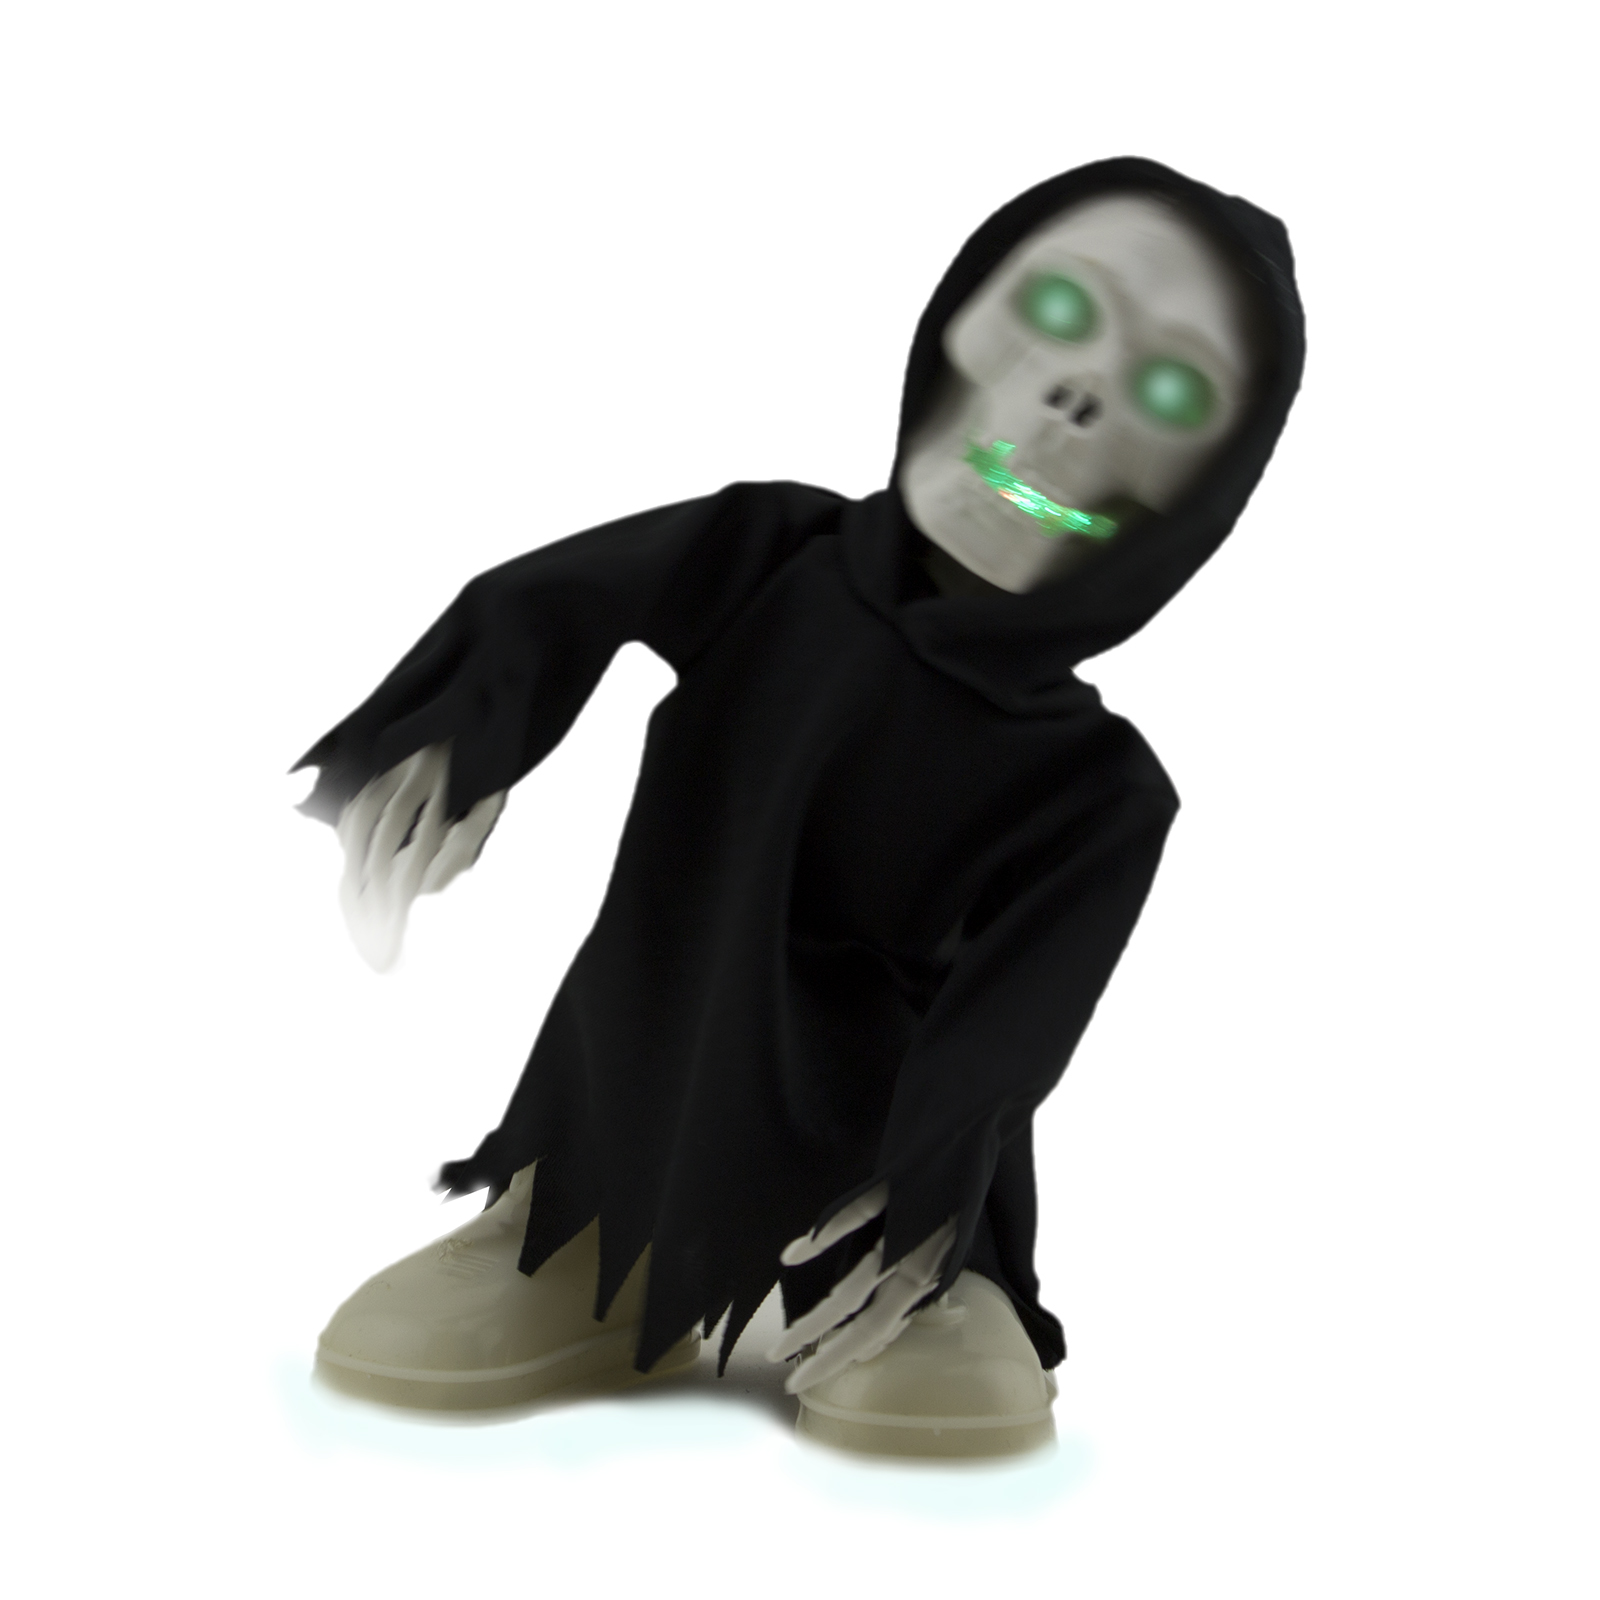 walking talking light up grim reaper animated skeleton halloween decoration eyes - Reaper Halloween